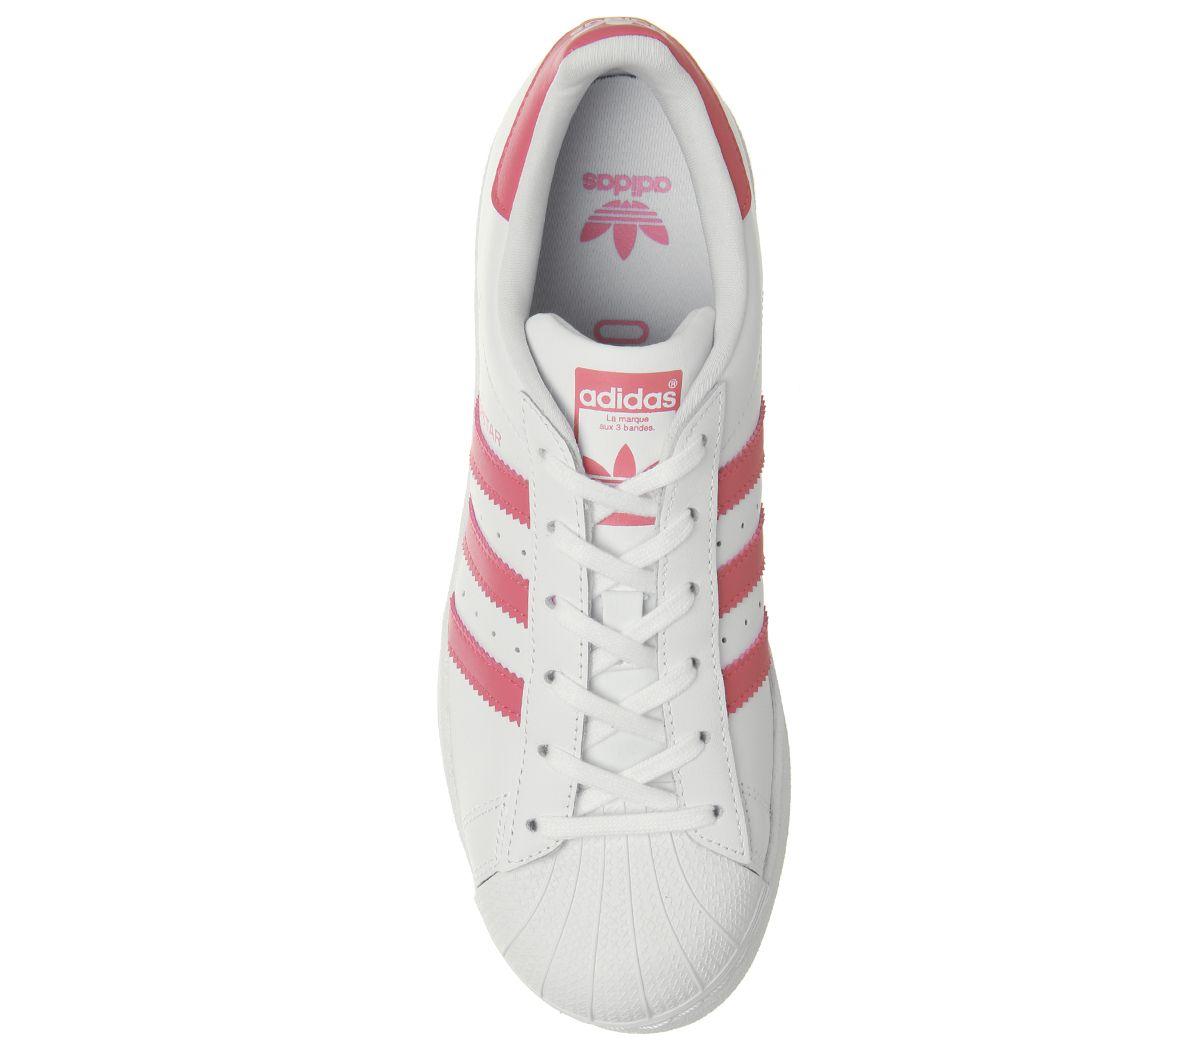 finest selection 0a102 b355c Da-Donna-Adidas-Superstar-GS-Scarpe-da-ginnastica-